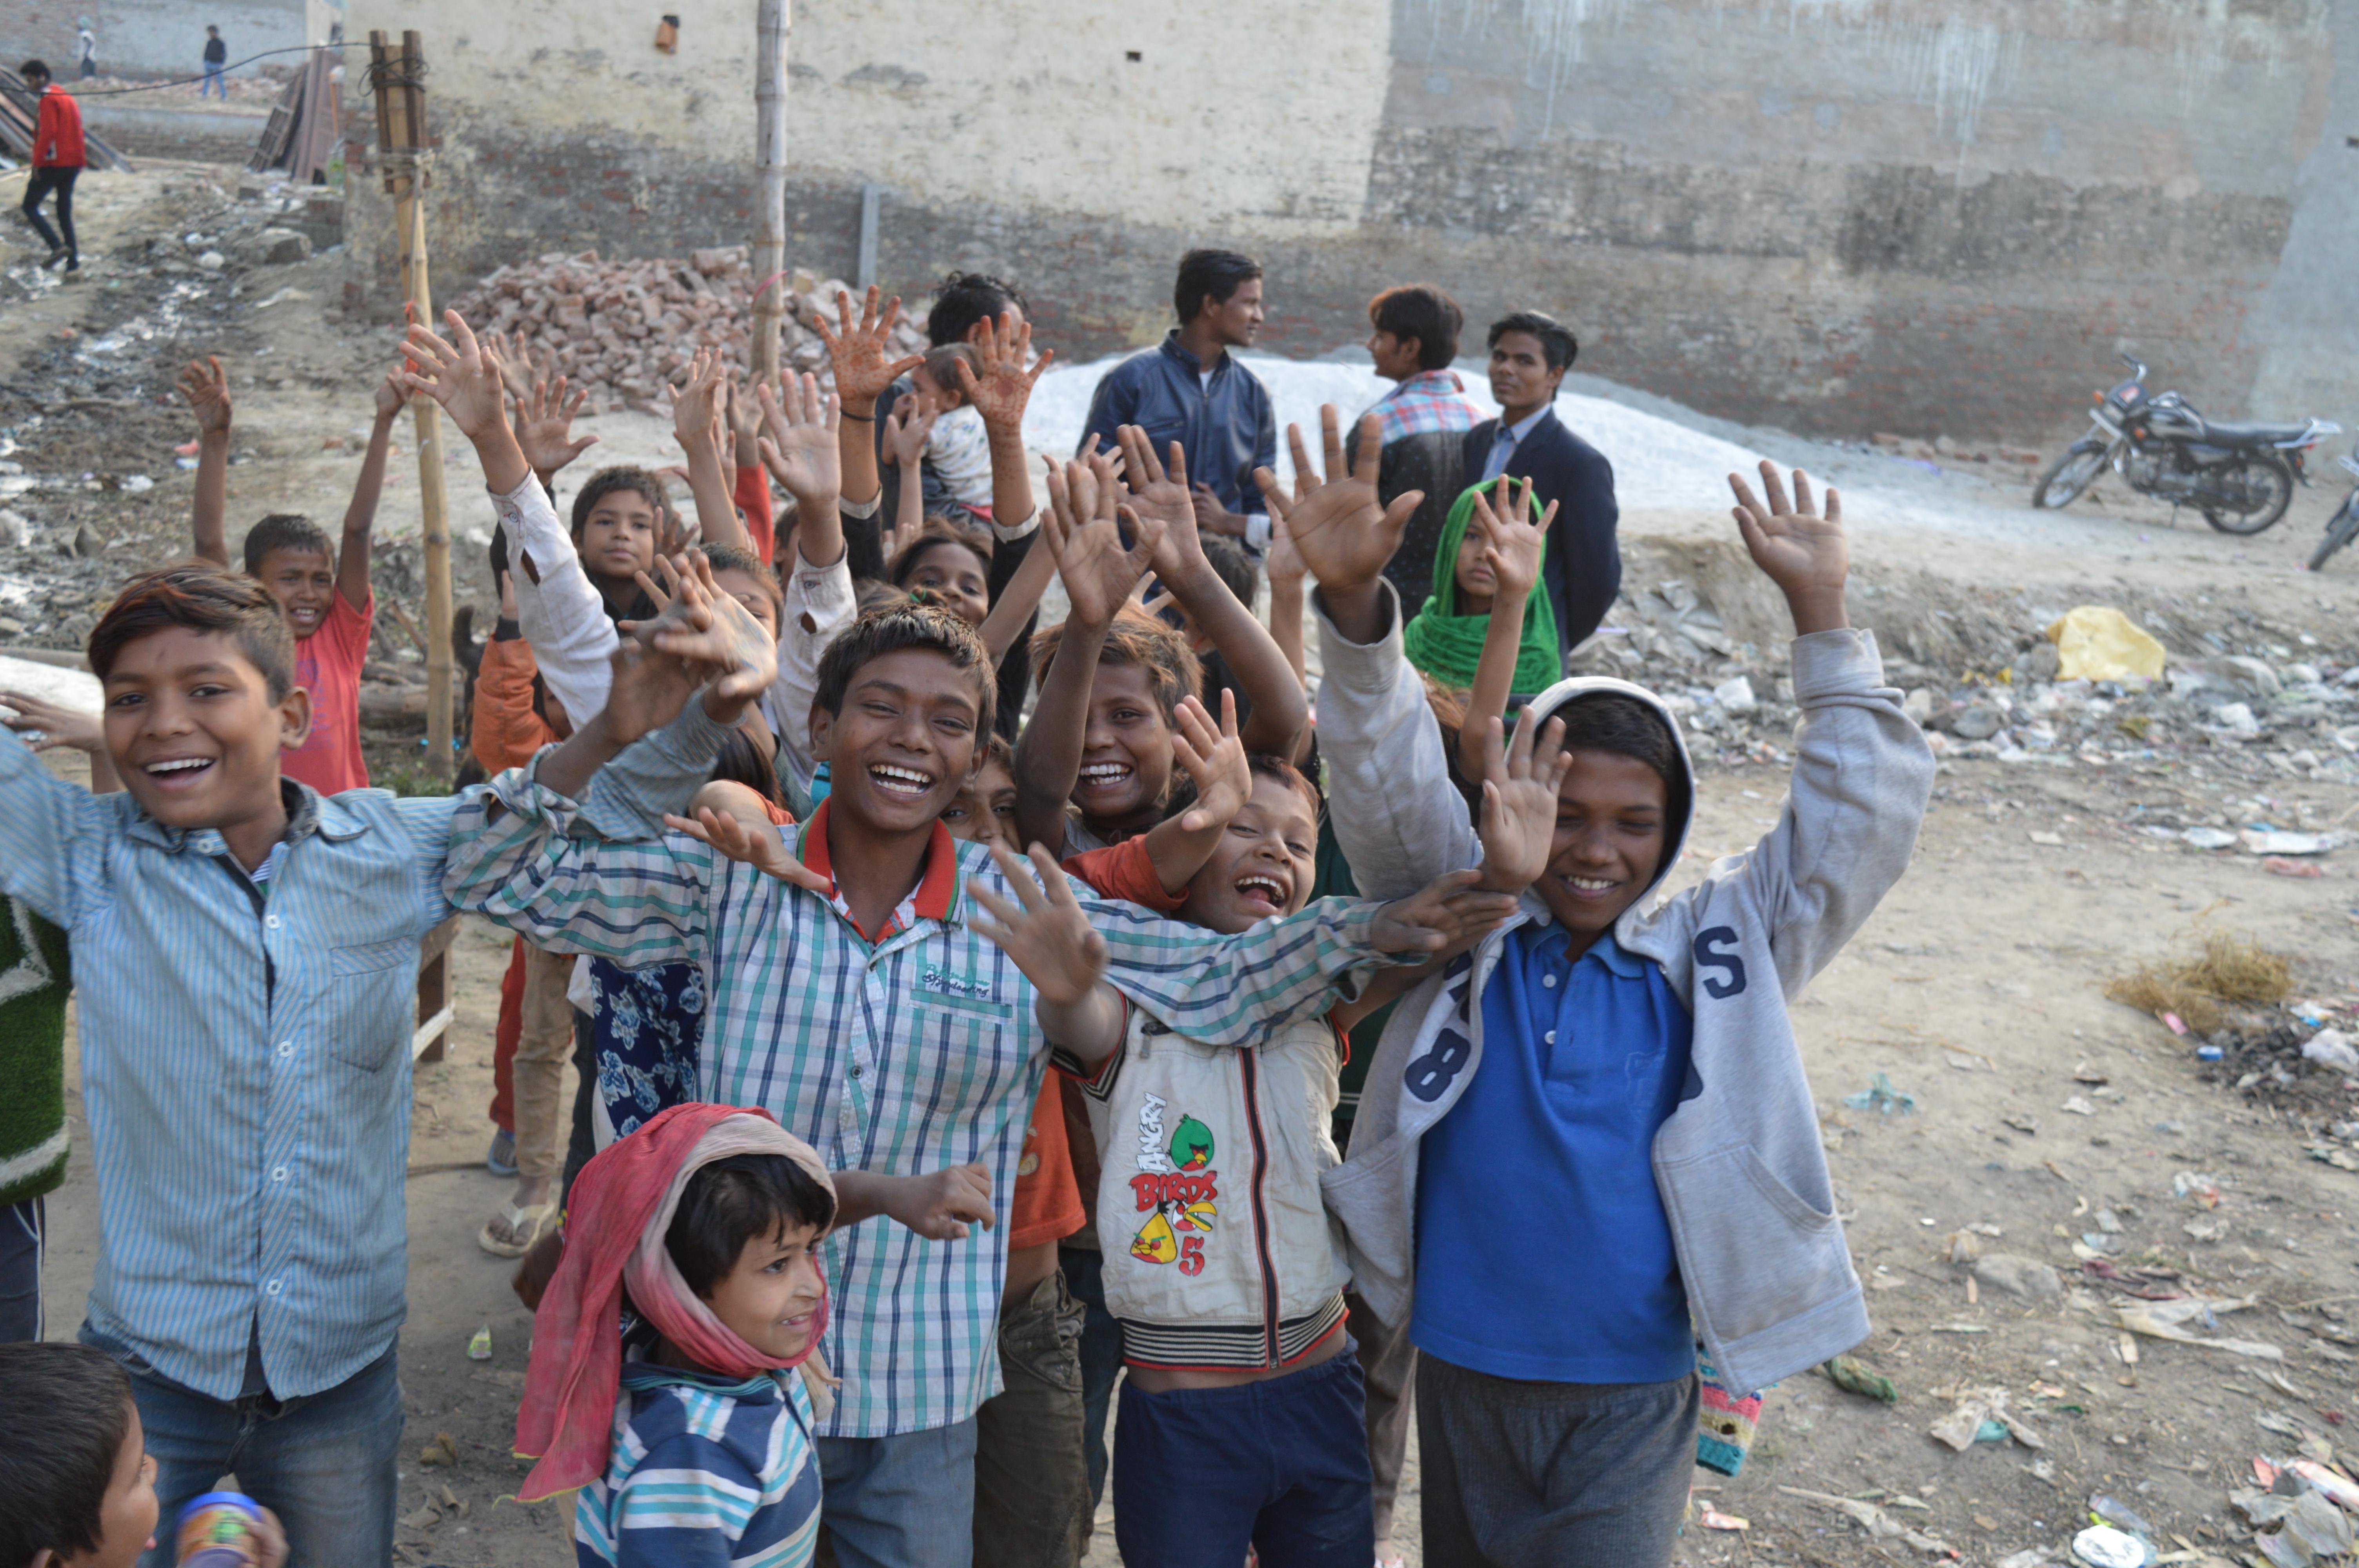 voice of slums, education, education to the underprivileged, education for all, NGO, NGO in India, Education in India, Slum kids, Dev Pratap Singh, Chandni Khan, Positive news, positive stories, inspiring people, inspiring initiatives, वौइस् ऑफ़ स्लम्स, प्रशिक्षण,ड्रग्स, स्लम्स, चांदनी खान, देव प्रताप सिंह, झुग्गी, झोपड़ी, बच्चे, शिक्षा,